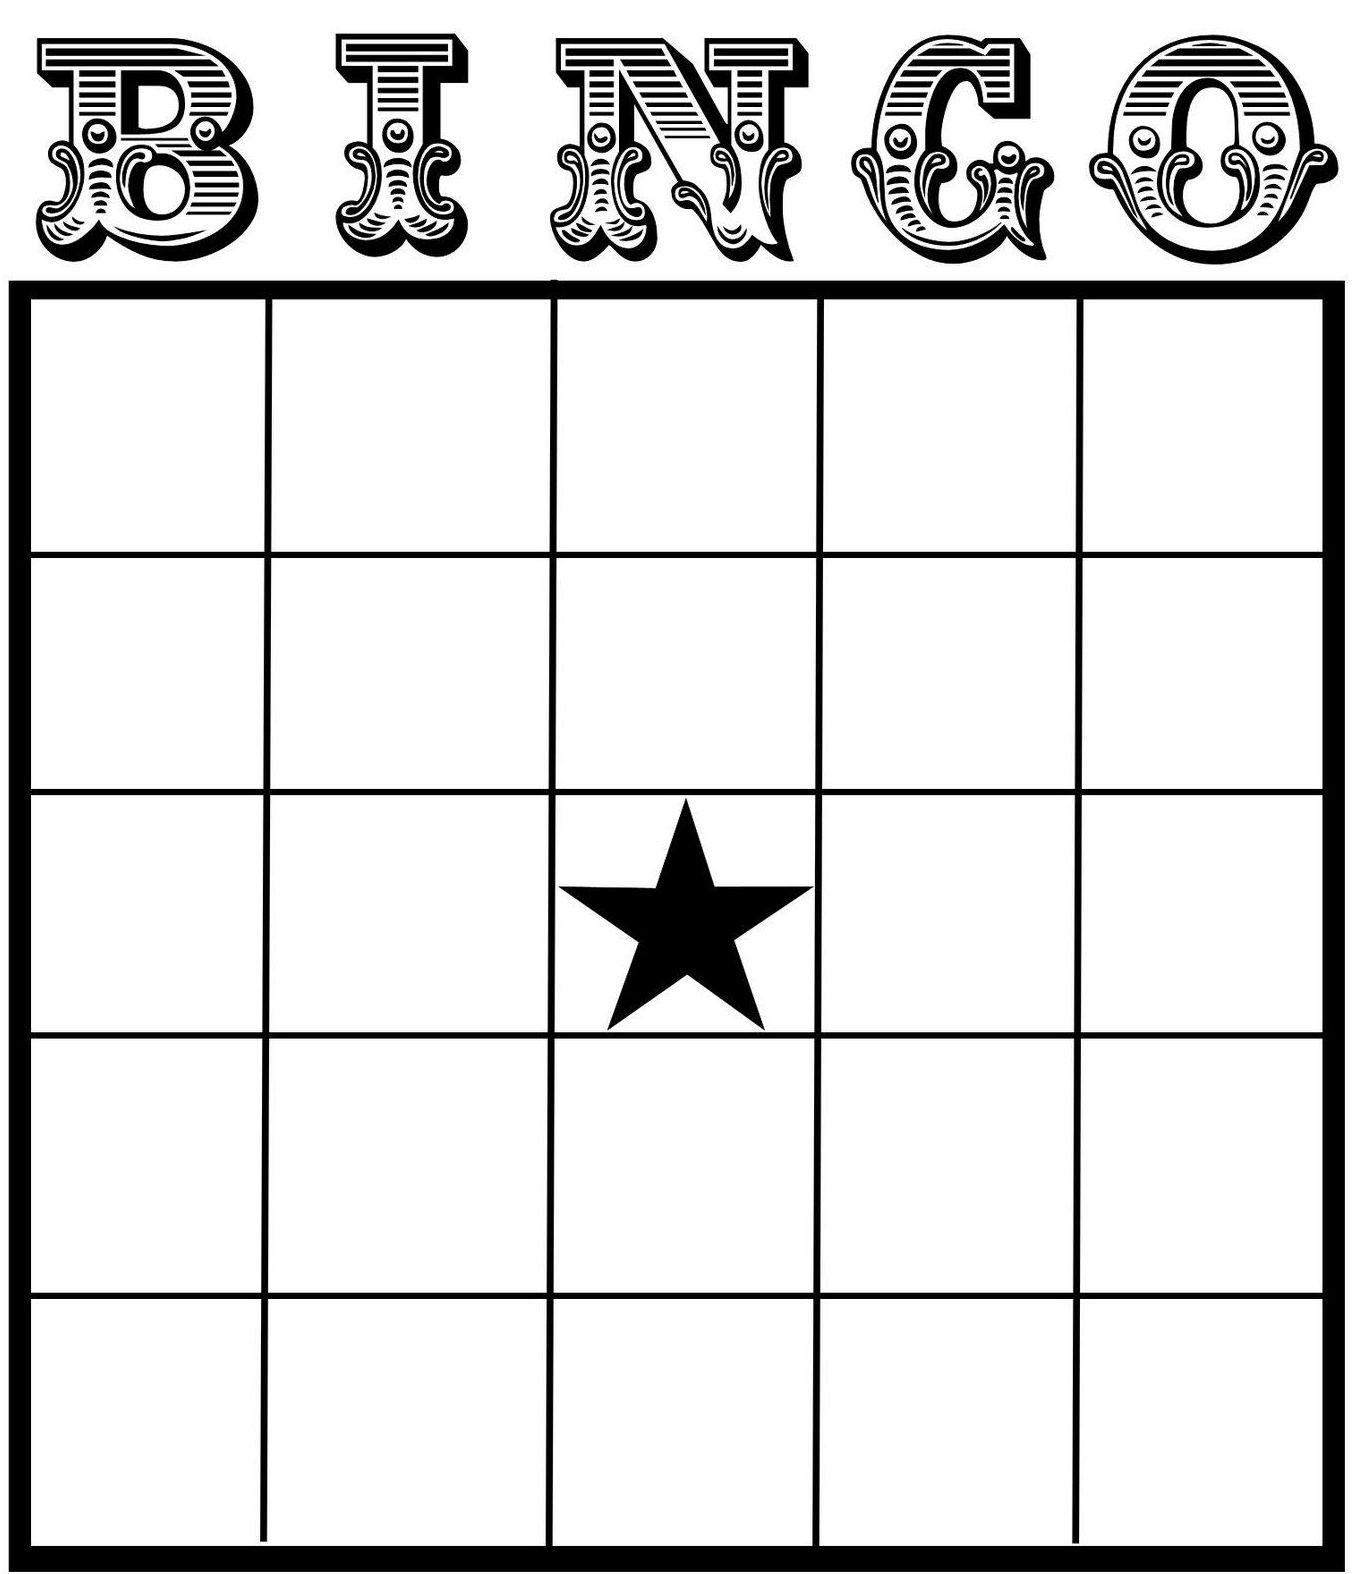 Free Printable Blank Bingo Cards  Printable Bingo Cards Inside Bingo Card Template Word